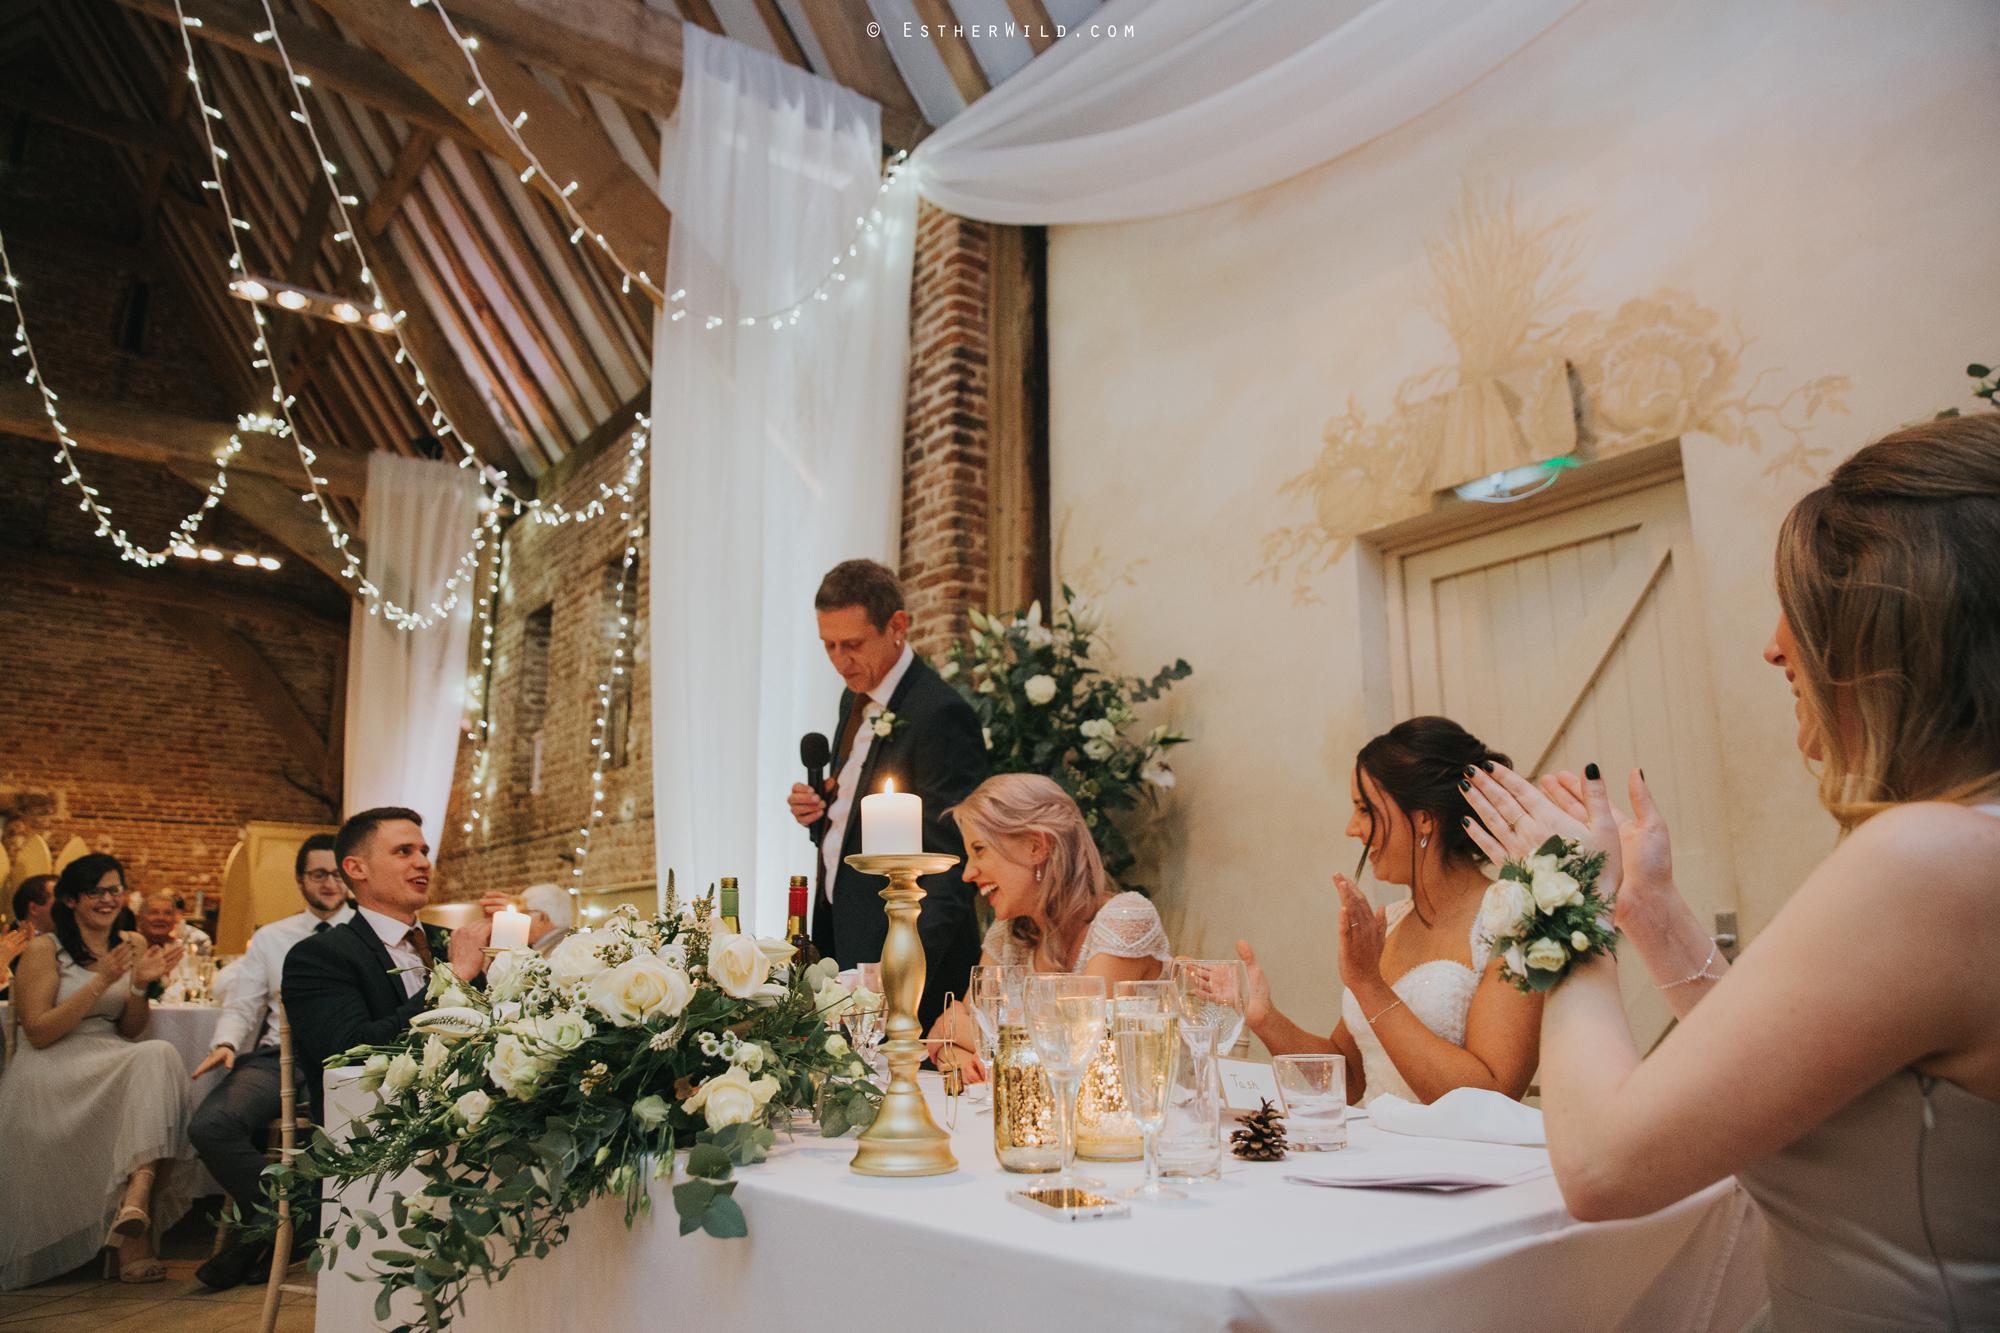 Elms_Barn_Weddings_Suffolk_Photographer_Copyright_Esther_Wild_IMG_2576.jpg